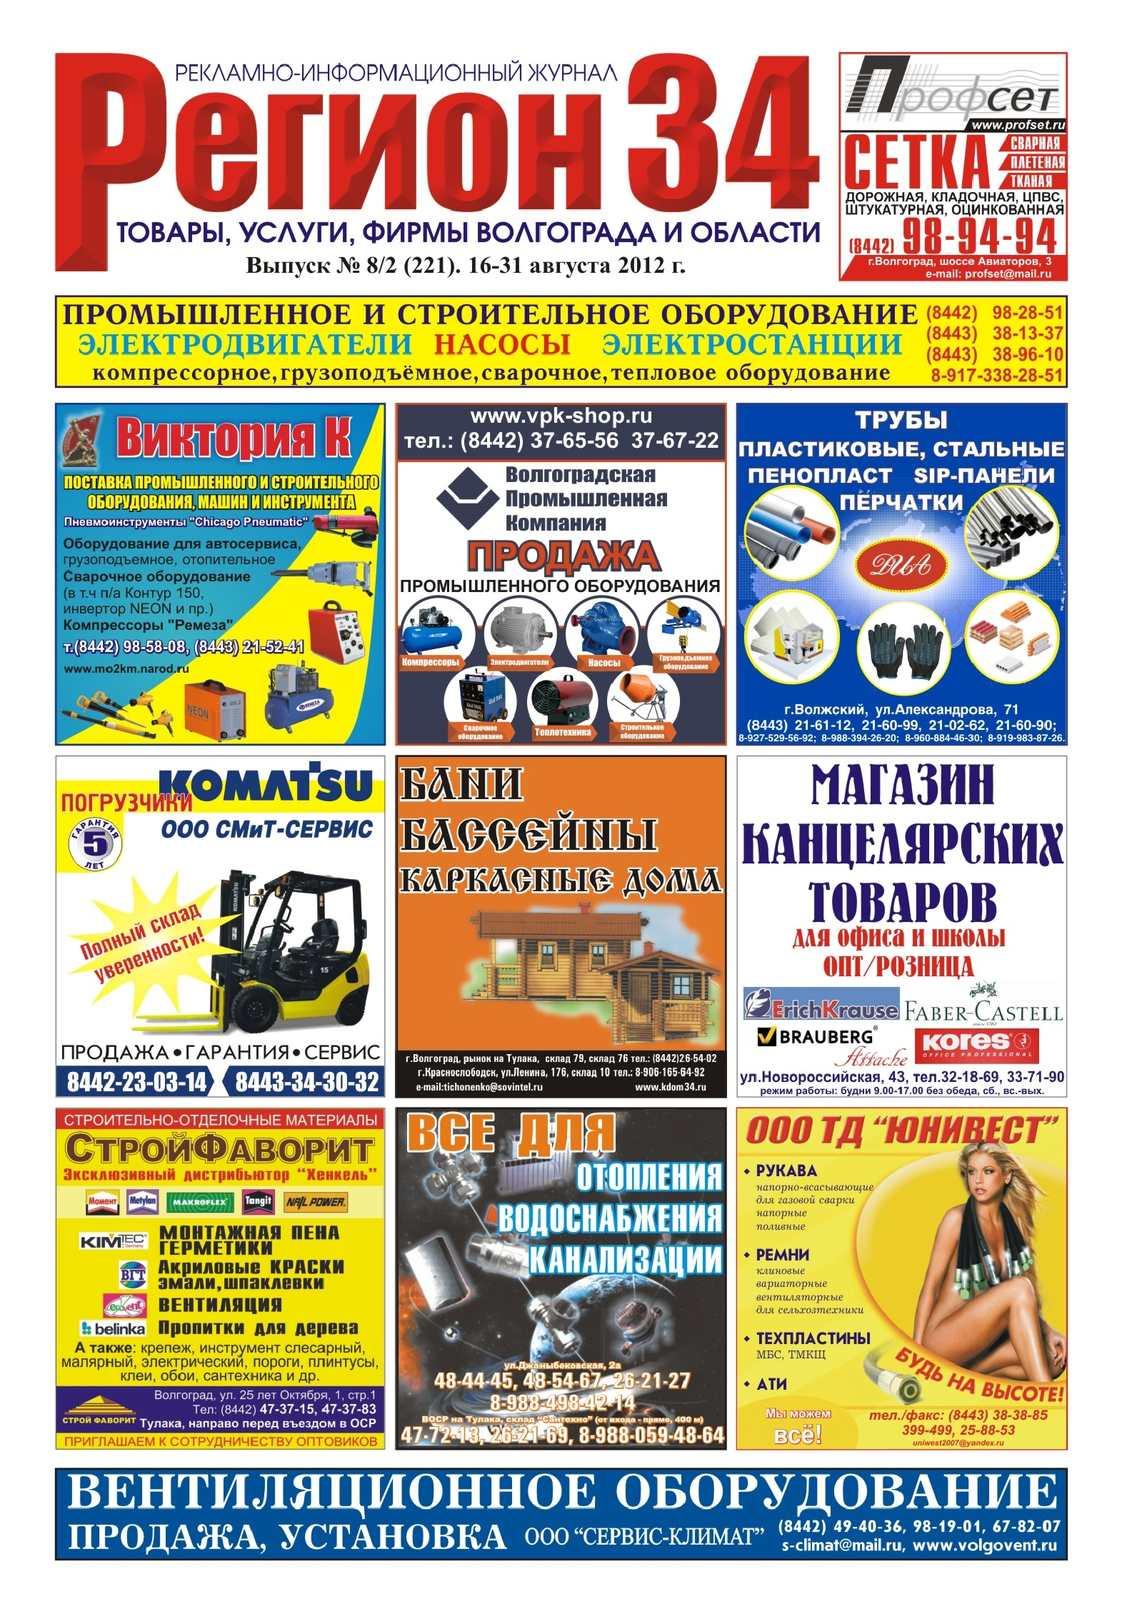 3f0346e51 Calaméo - Регион34 выпуск 221 август(2) 2012 г